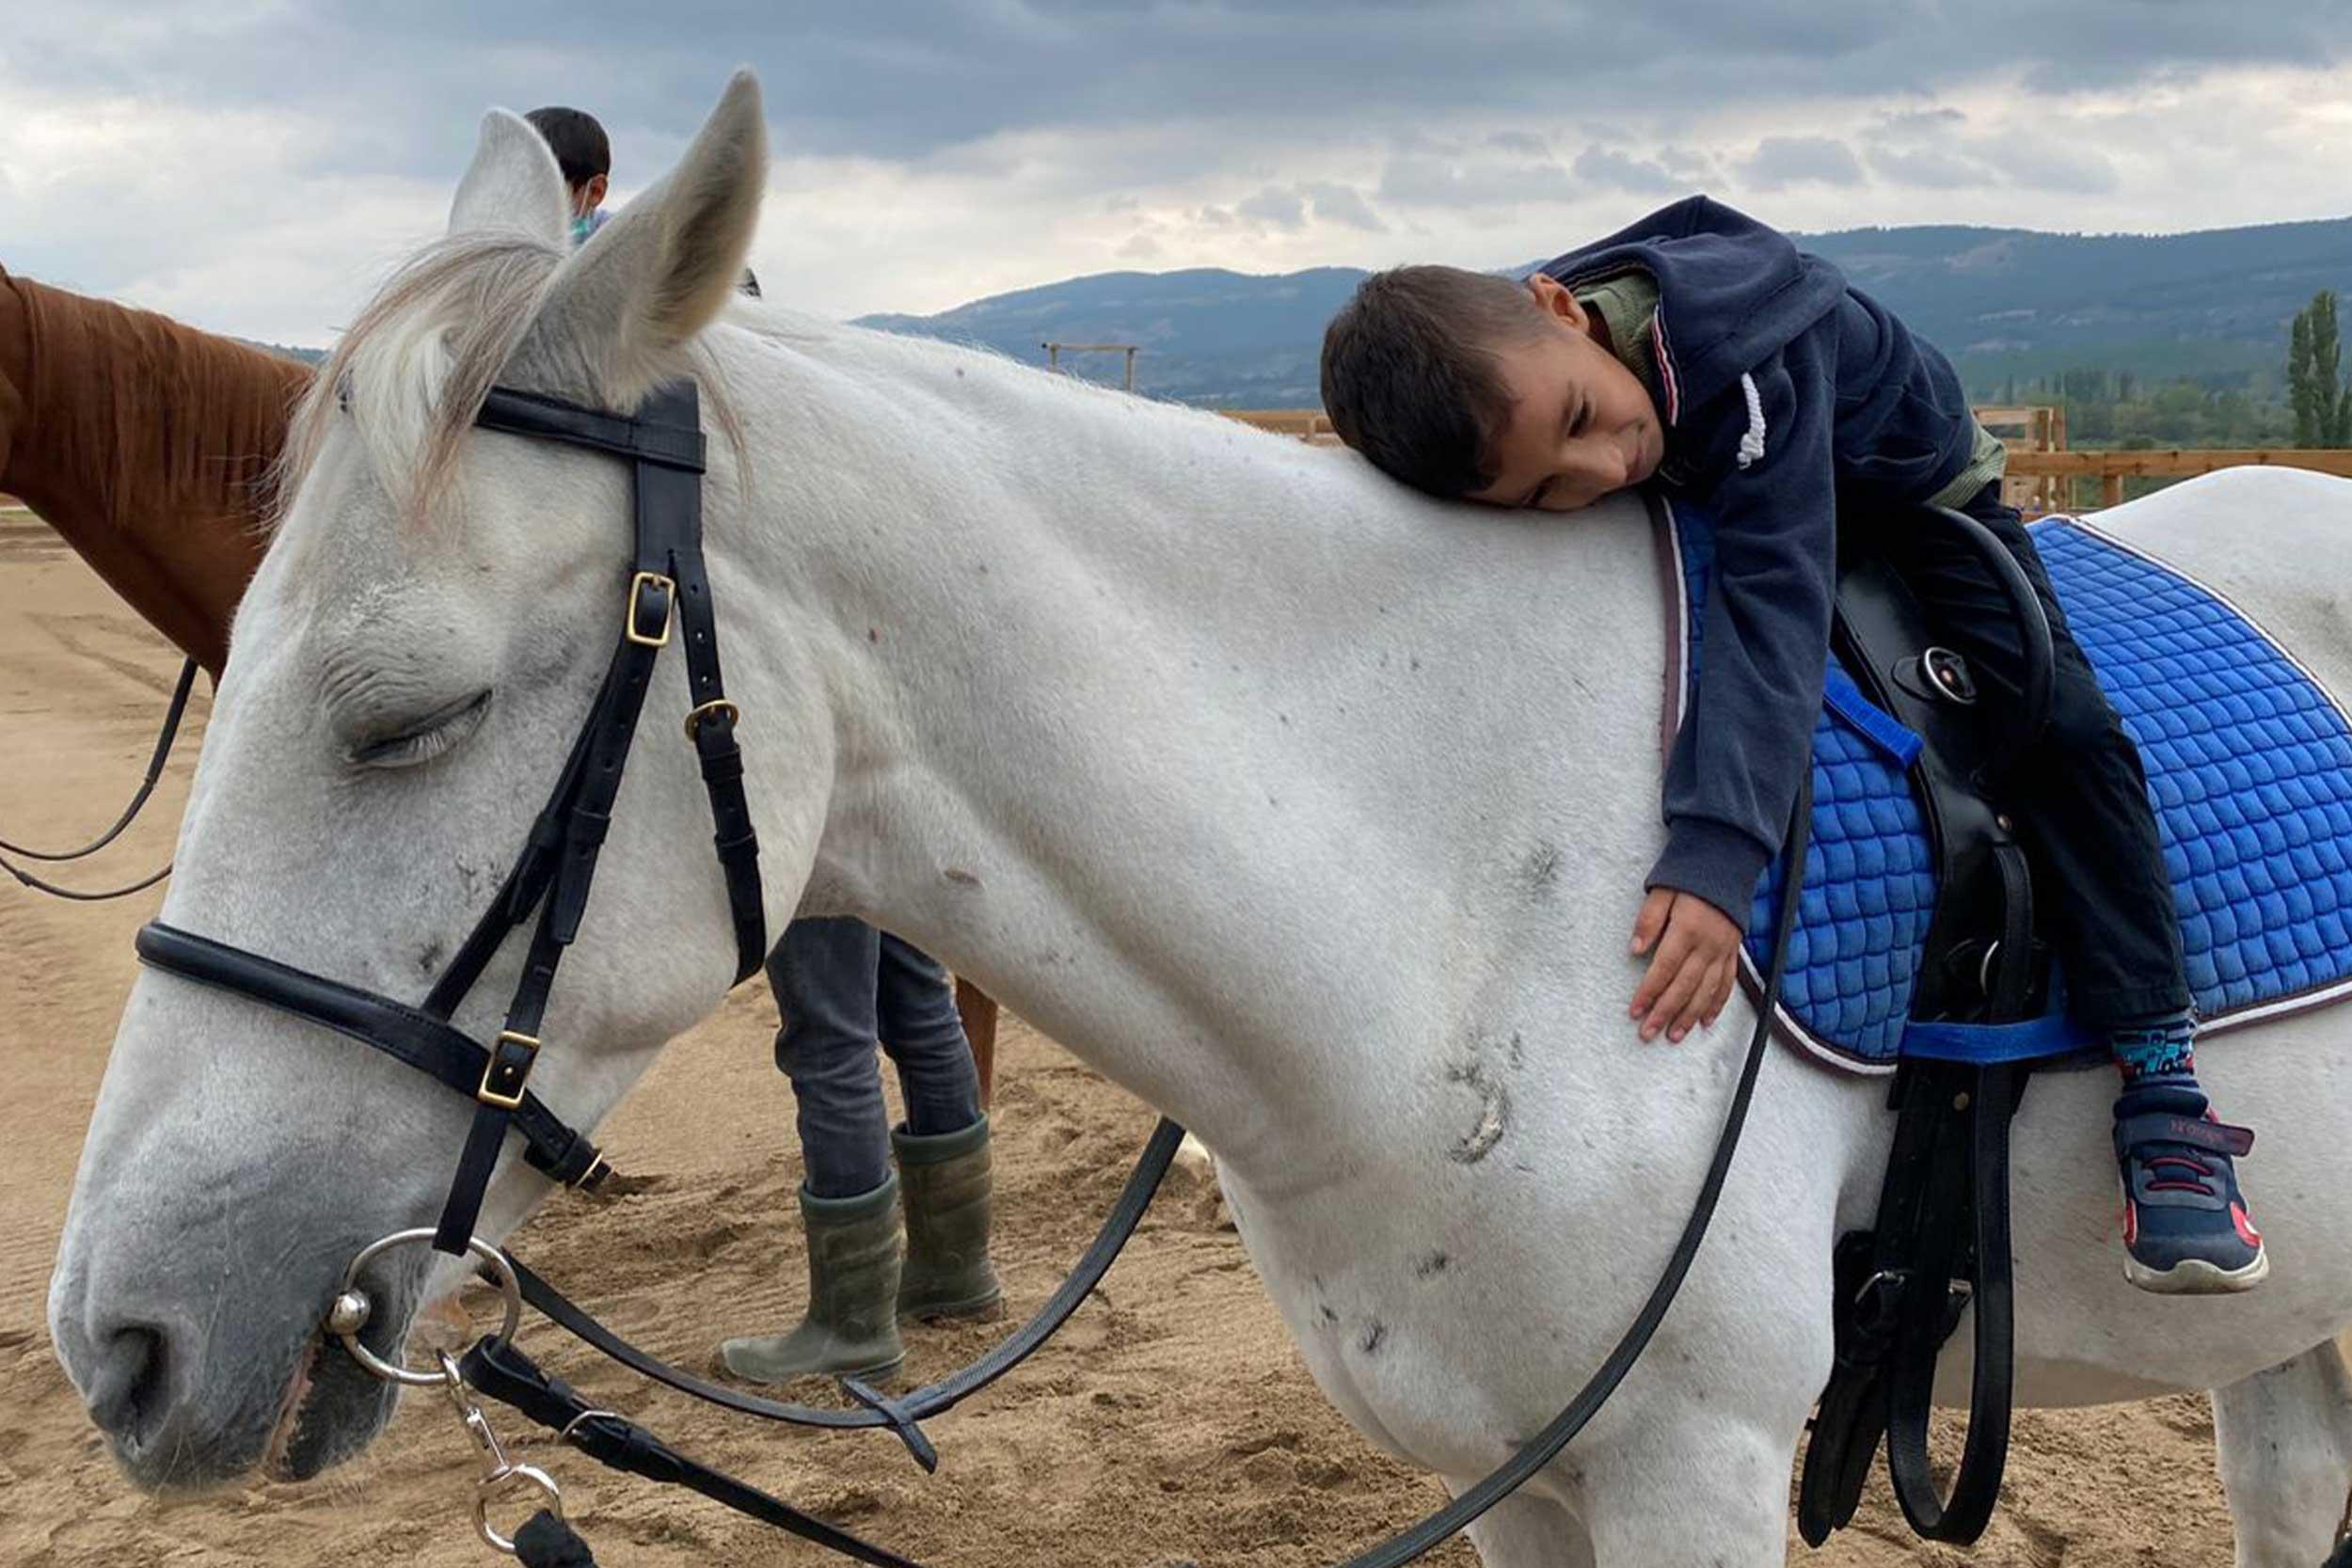 Bayramiç'te engelli çocuklara hipoterapi